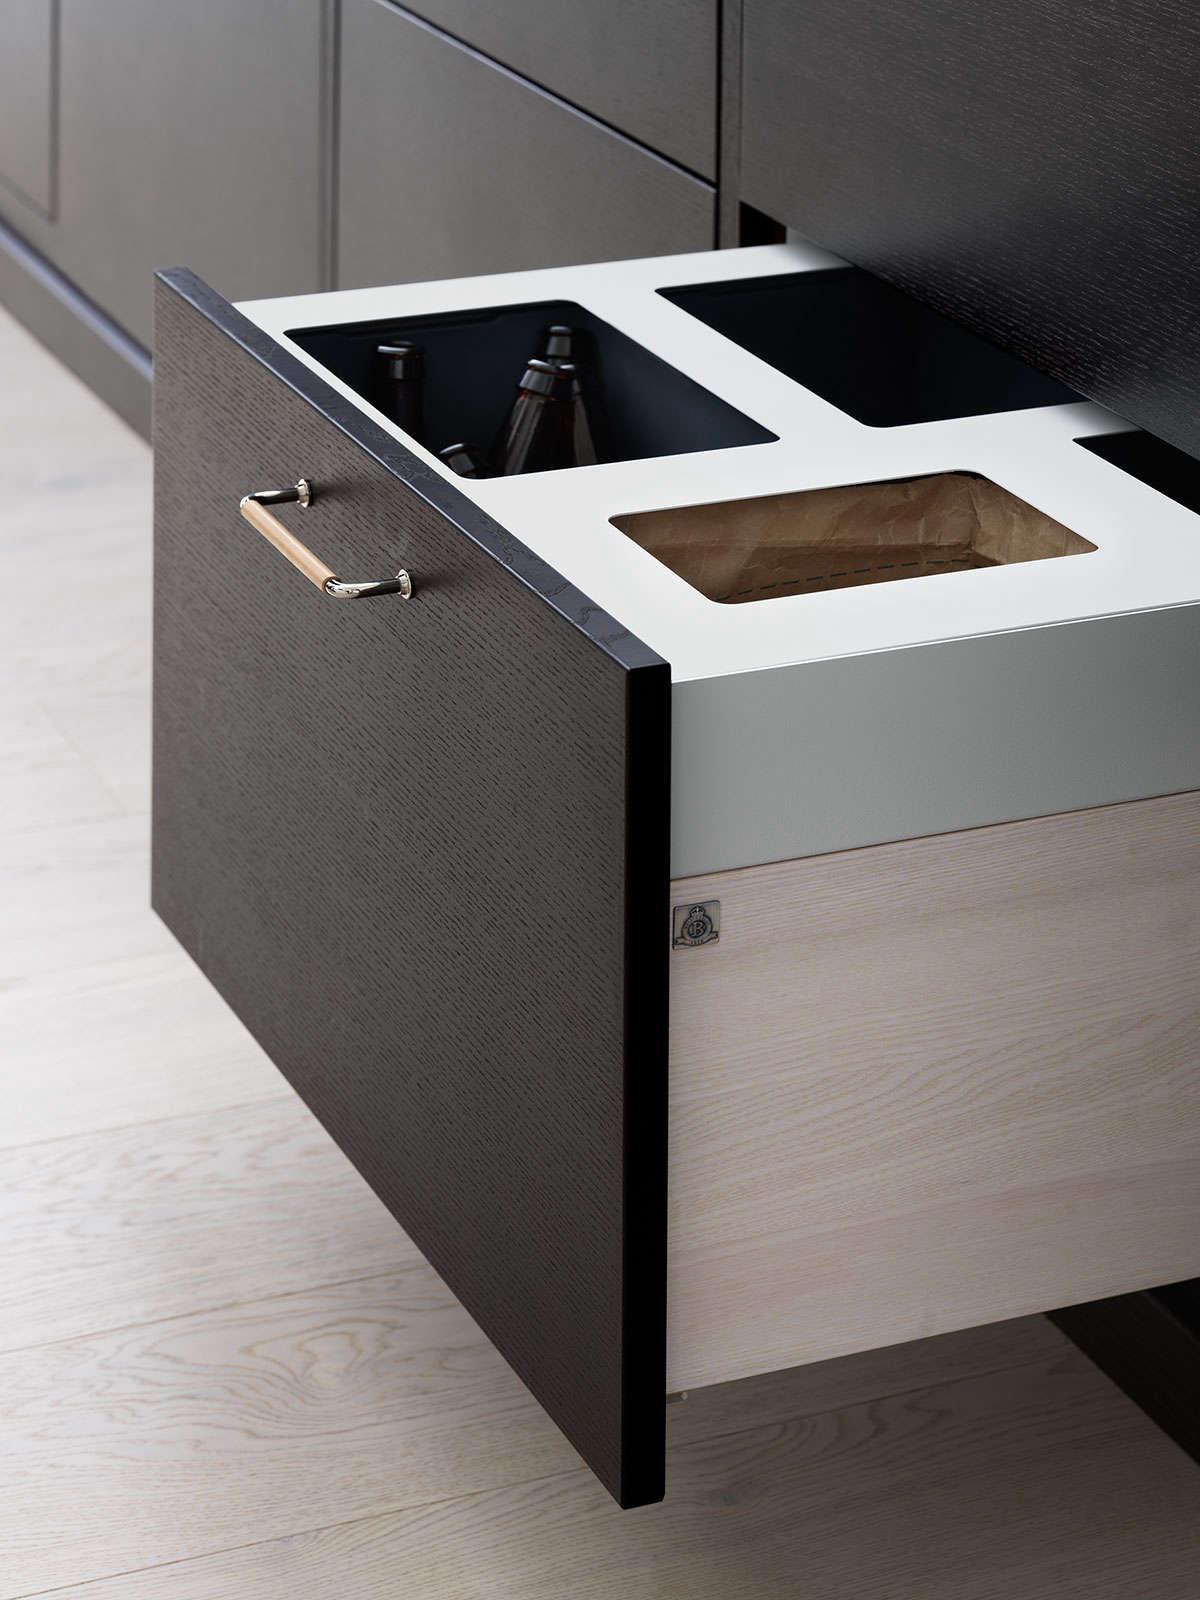 Bistro-kitchen-in-ash-brown-by-Ballingslov-of-Sweden-Remodelista-6